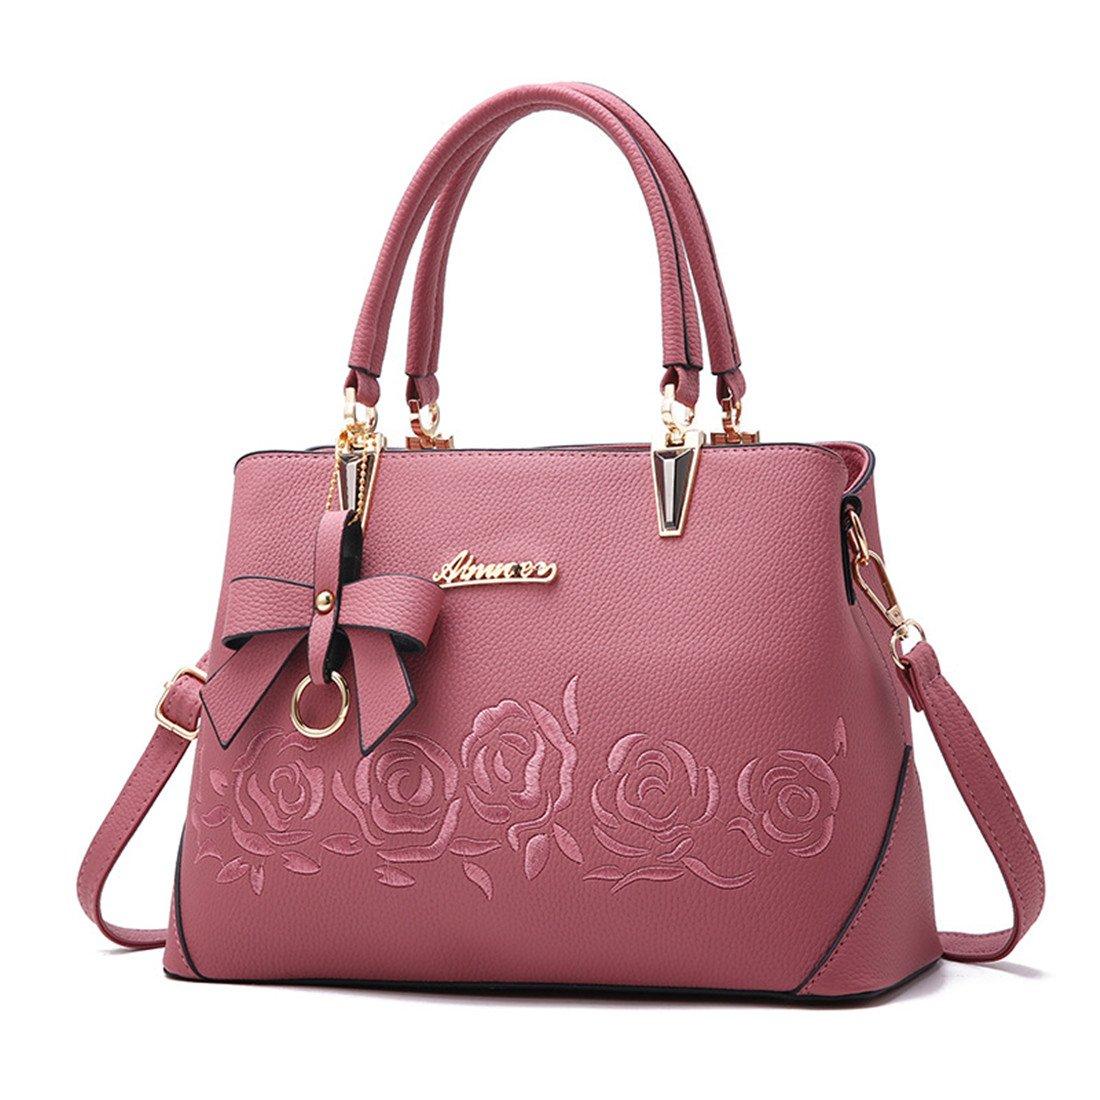 Mogor Women PU Leather Handbag Tote Shoulder Bag with Rose Embroidery Pink